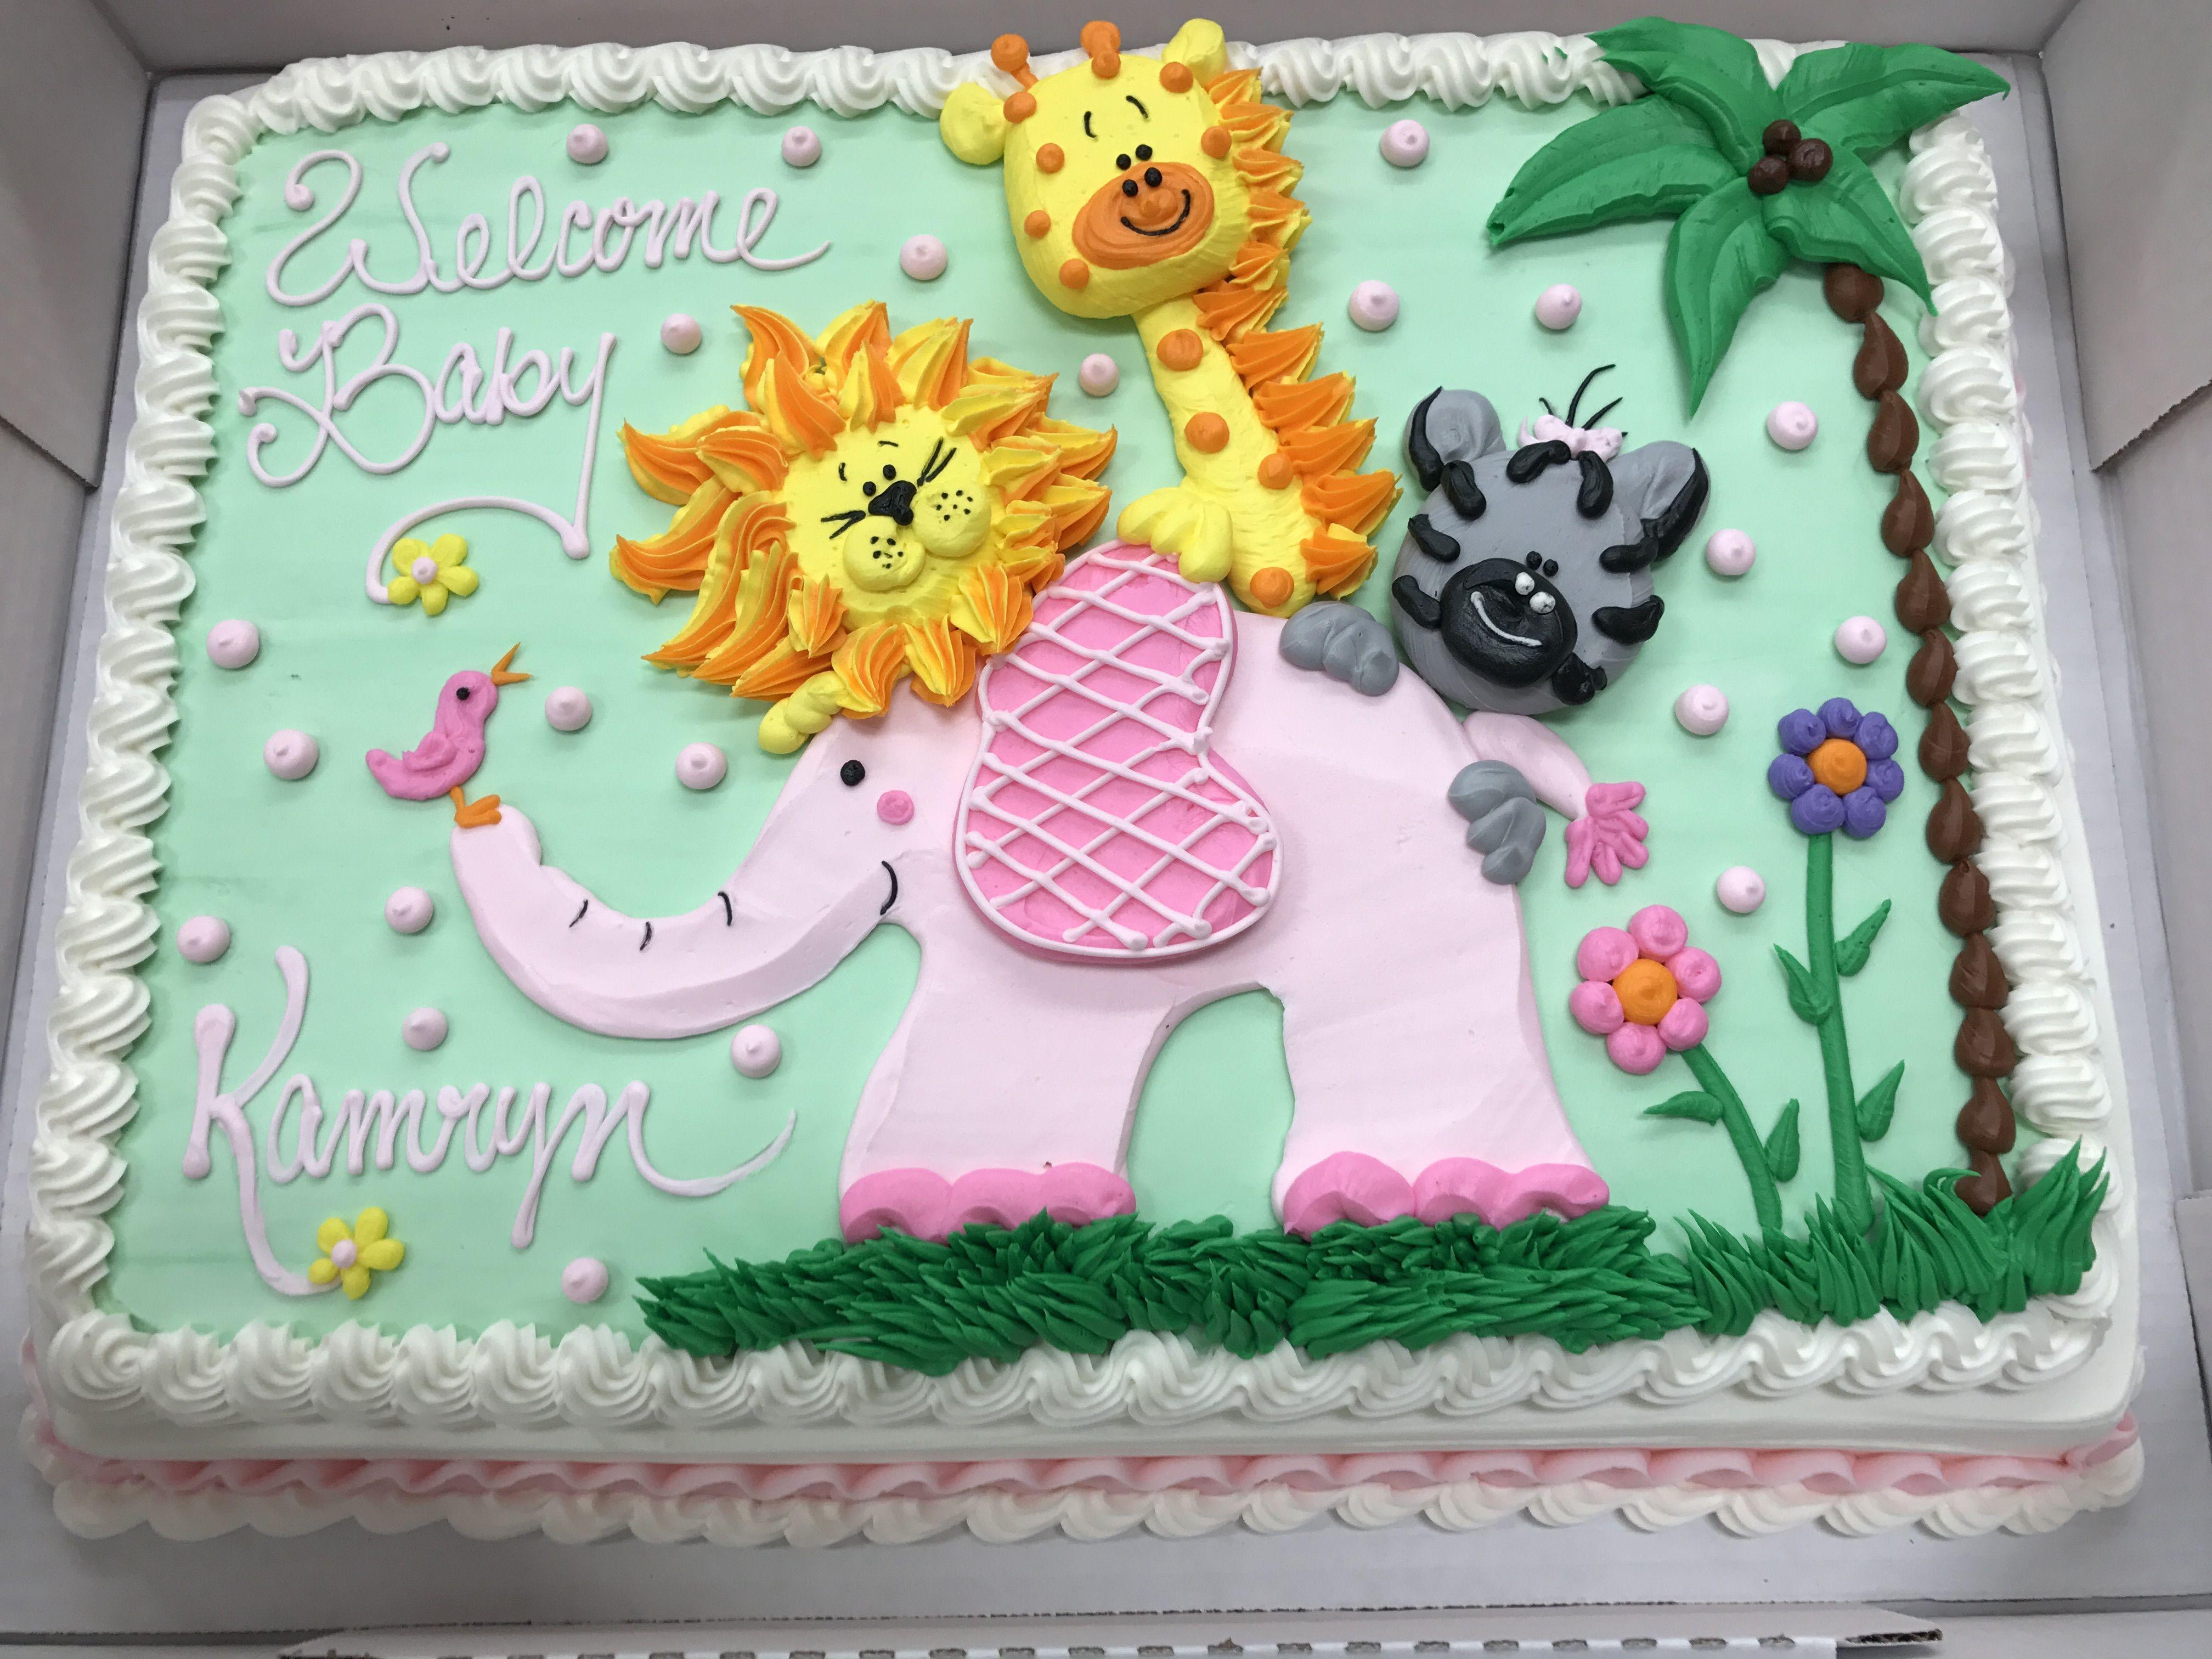 Jungle Baby Shower Cake Bakery Cakes In 2019 Cake